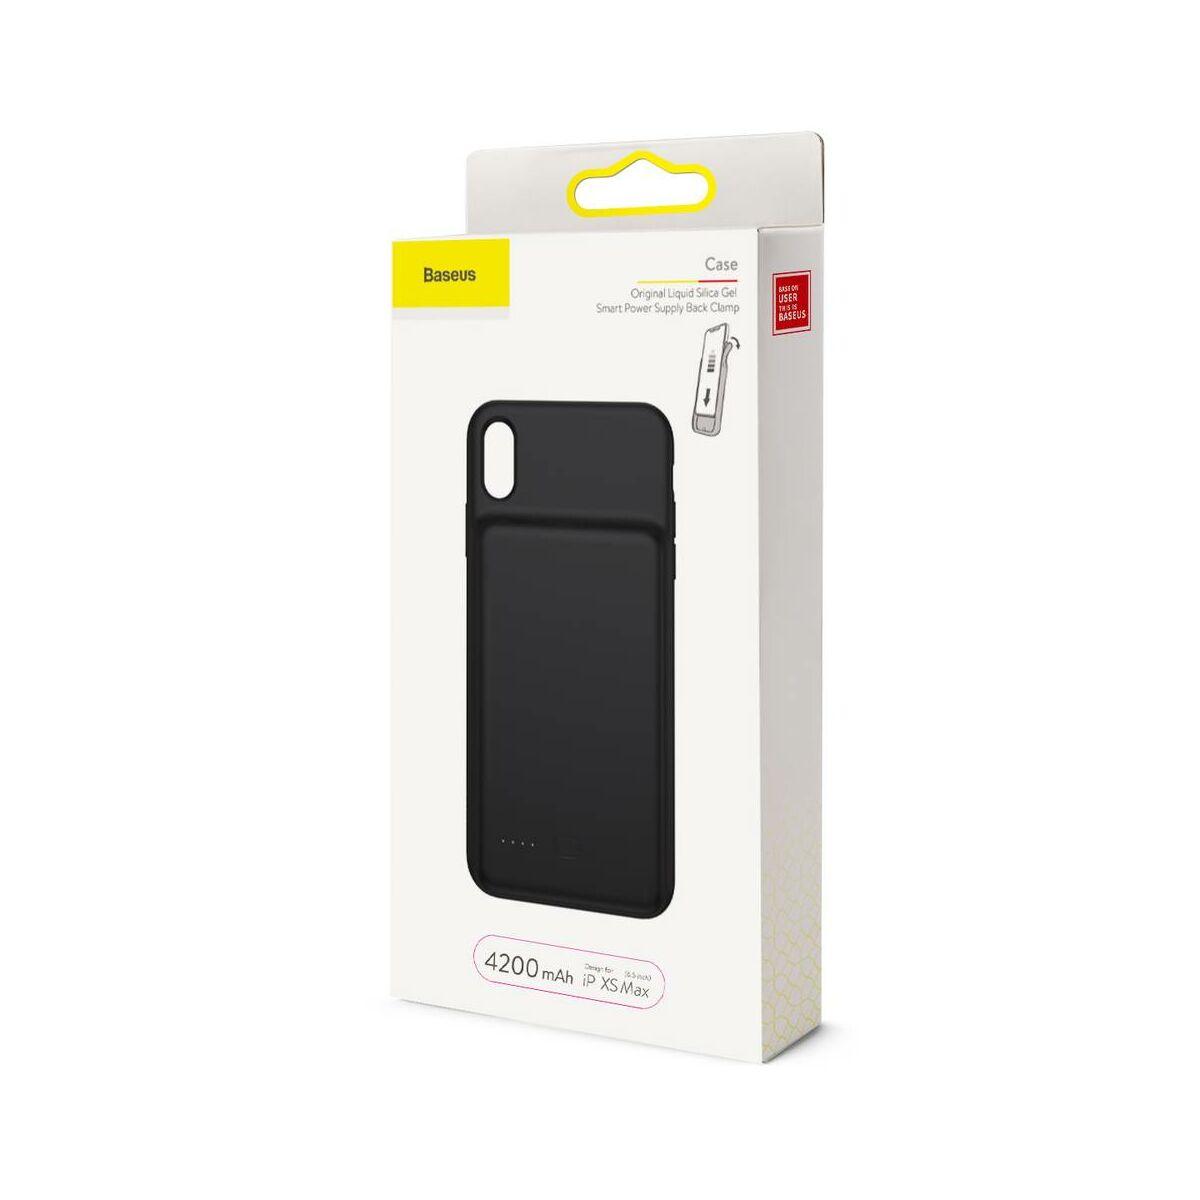 Baseus Power Bank tok, Liquid Silicone Smart back clamp 4200 mAh, XS Max, fekete (ACAPIPH65-BJ01)